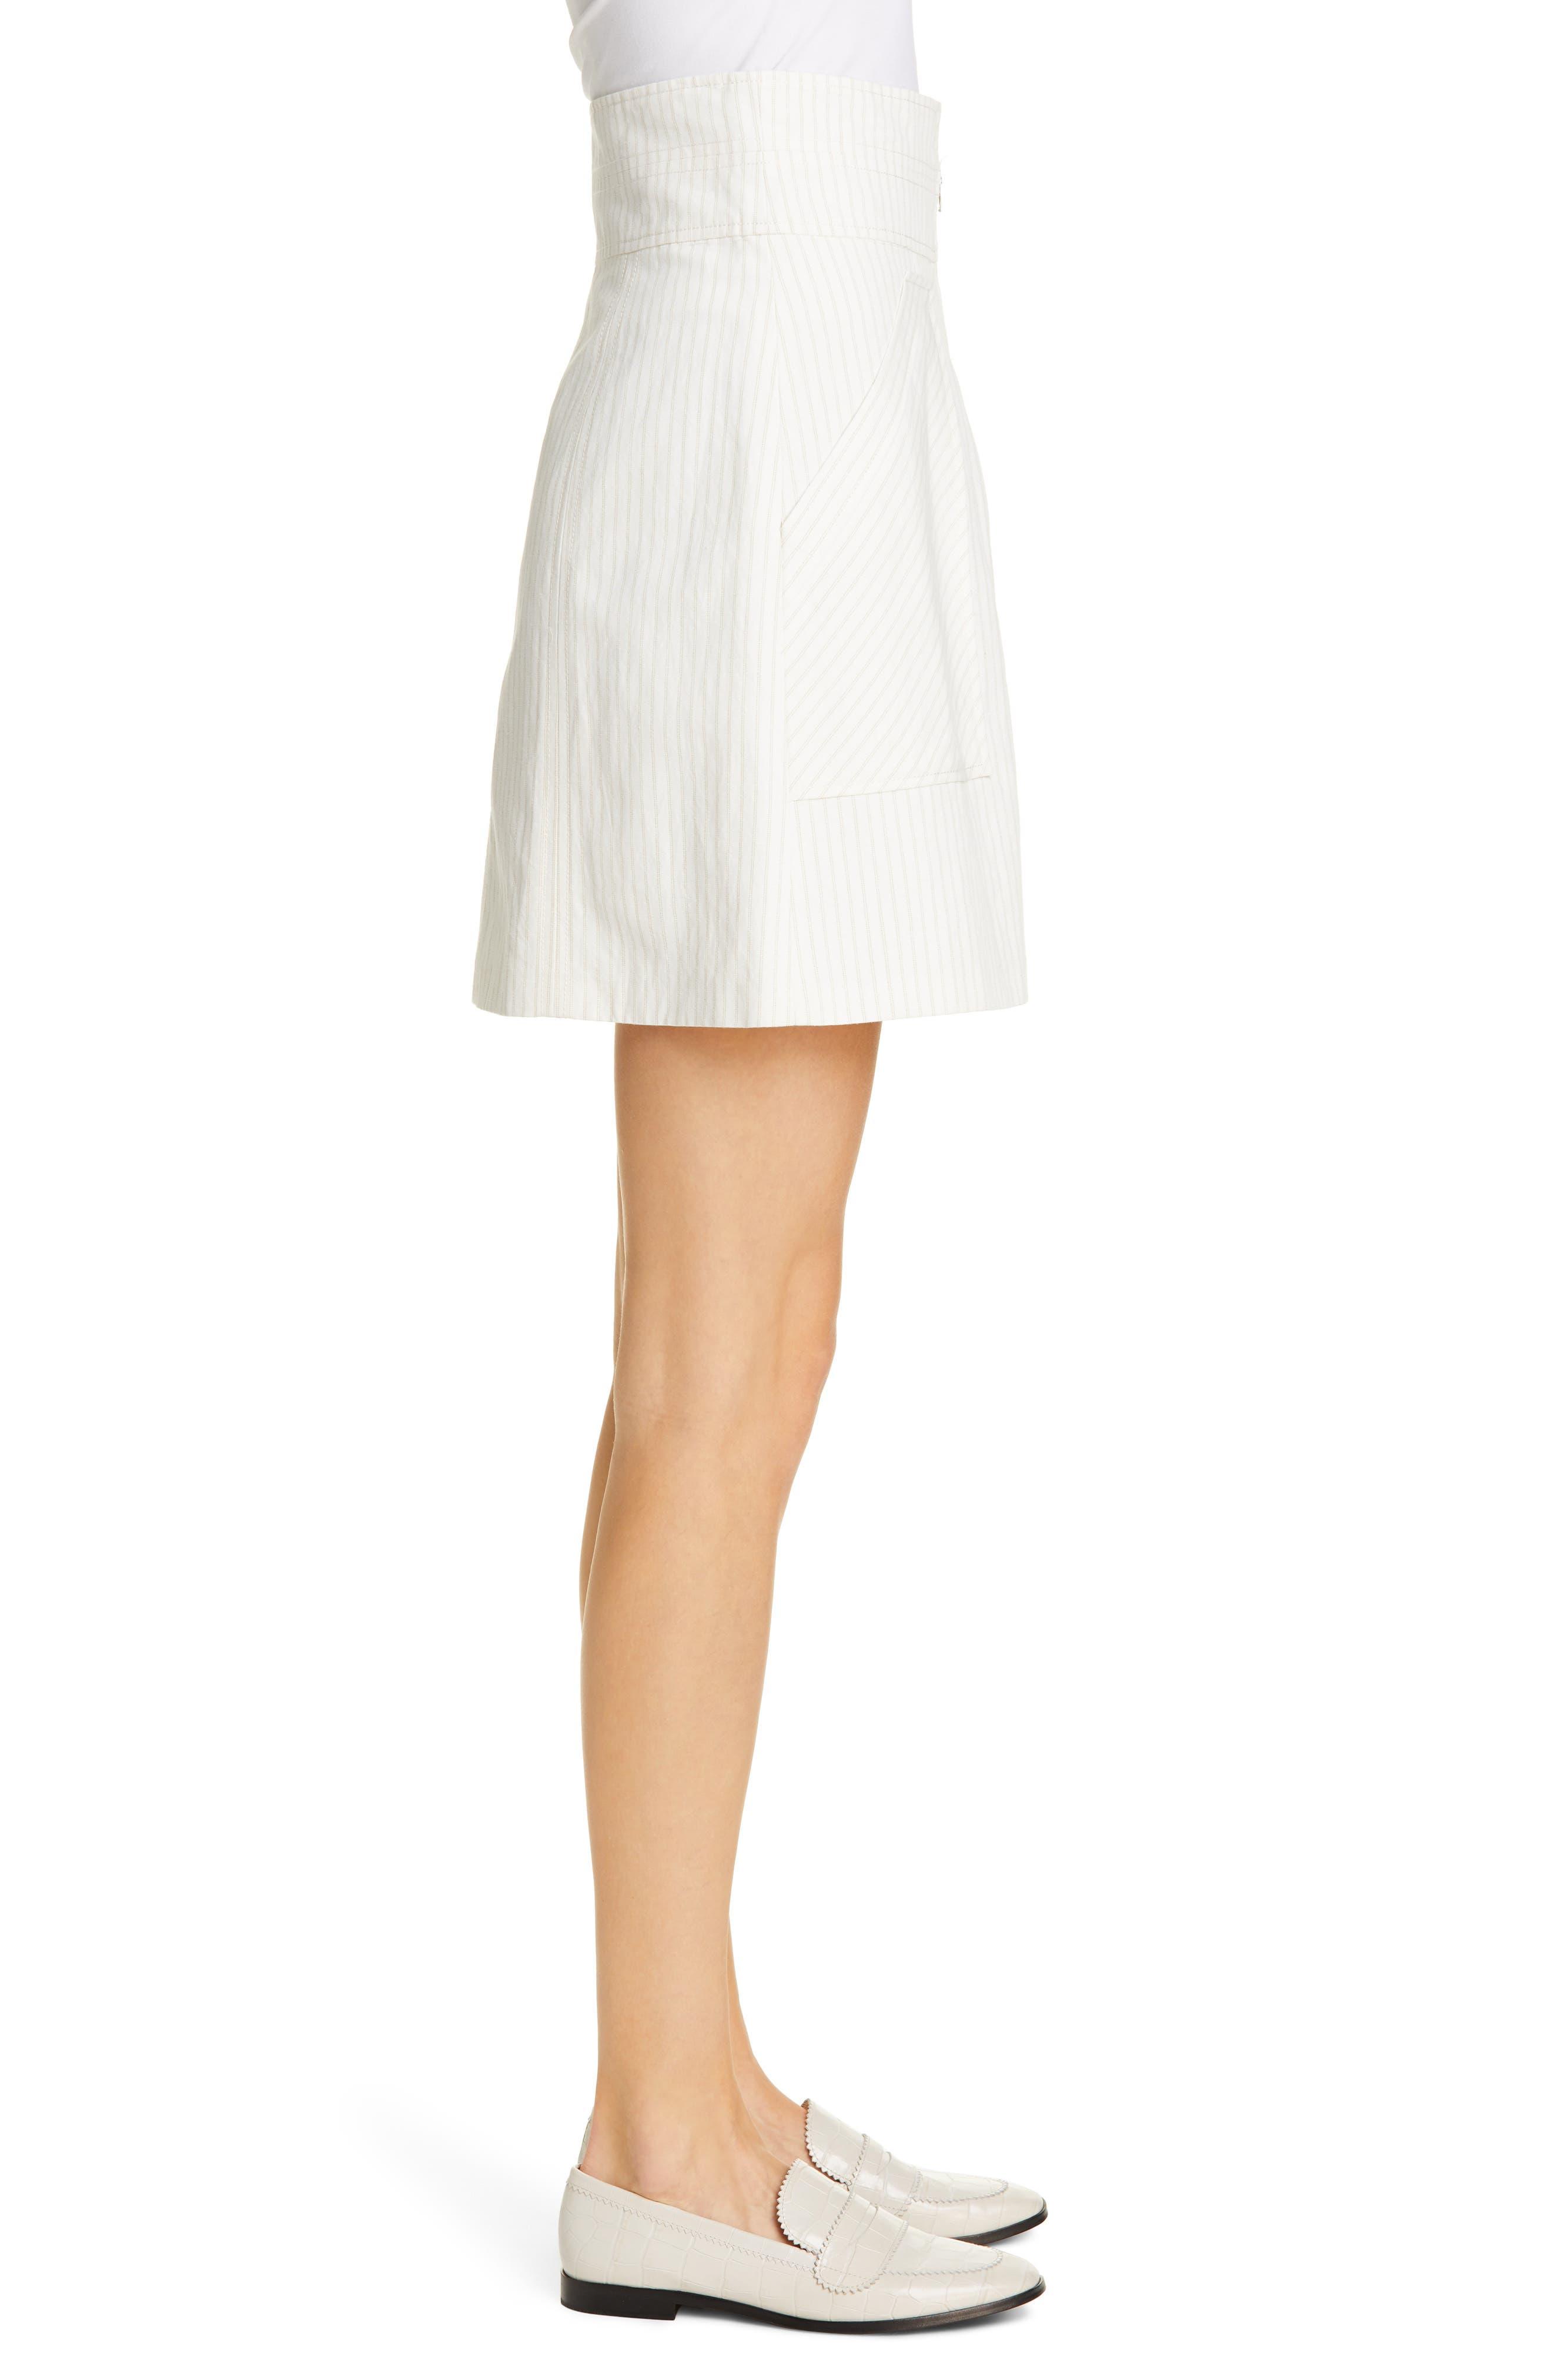 REBECCA TAYLOR, Zip Front Pinstripe Cotton & Linen Skirt, Alternate thumbnail 3, color, SNOW COMBO